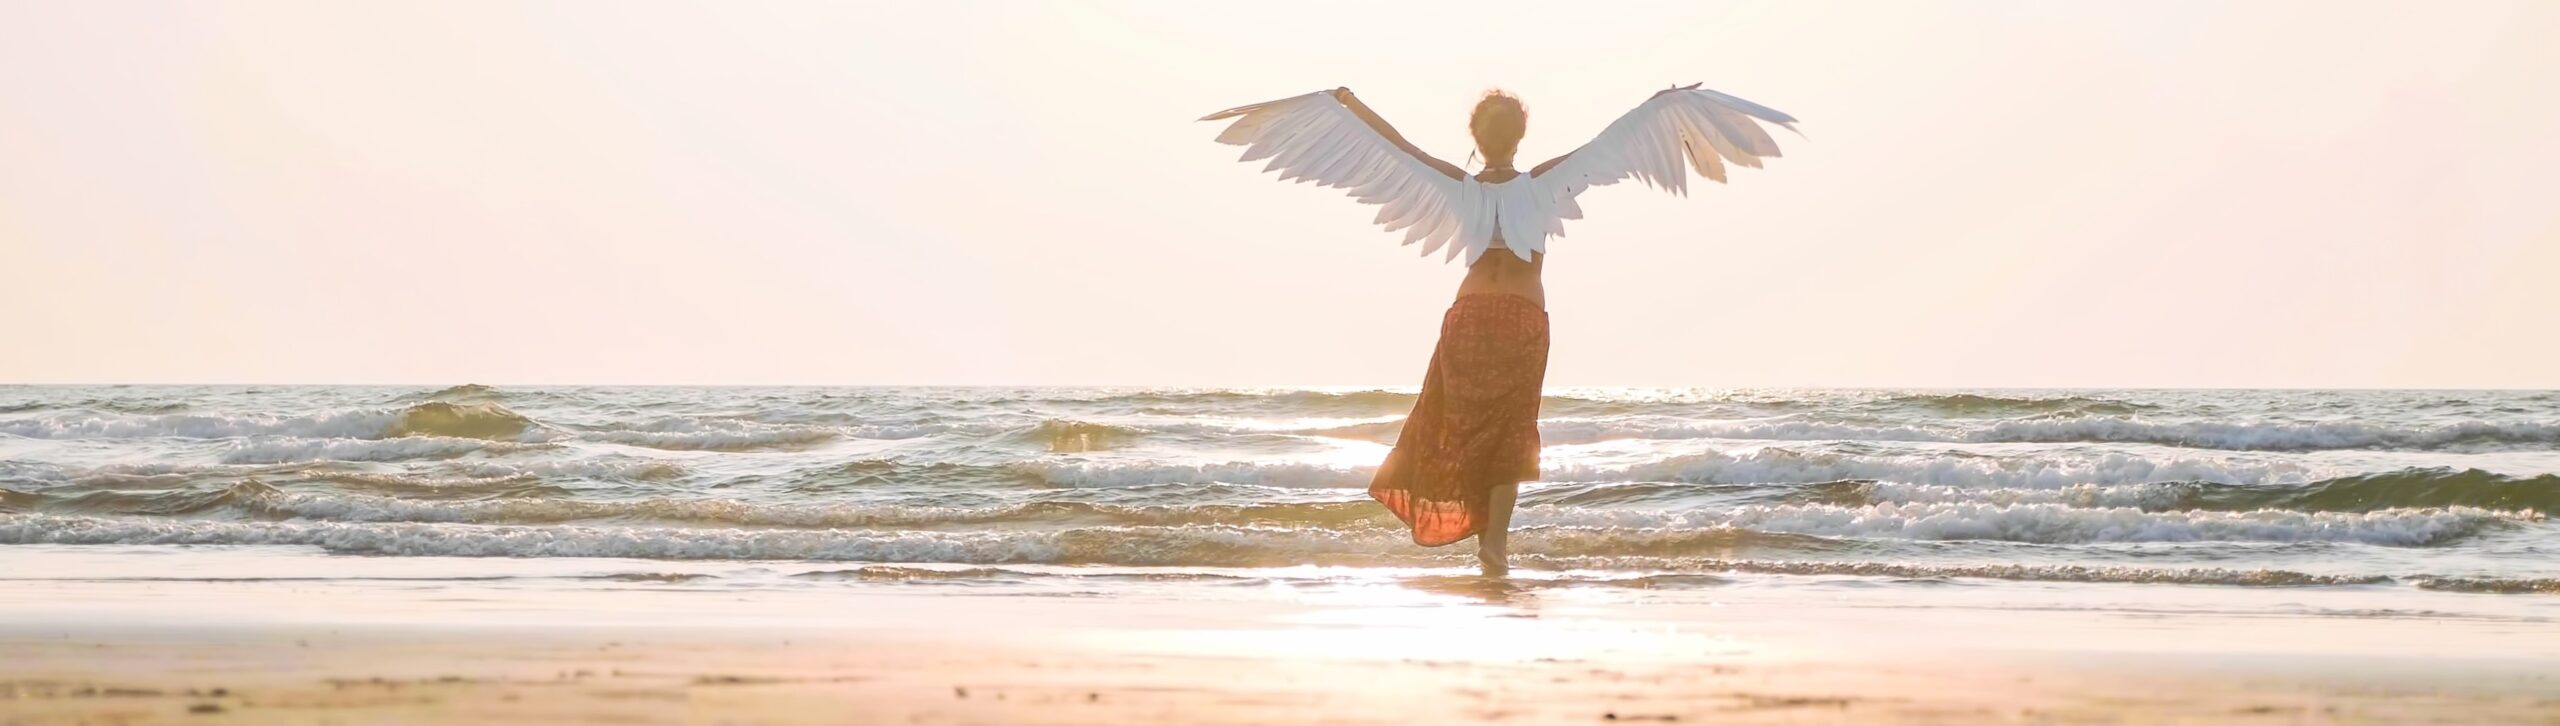 angeli-onostranstvo-portal8-si